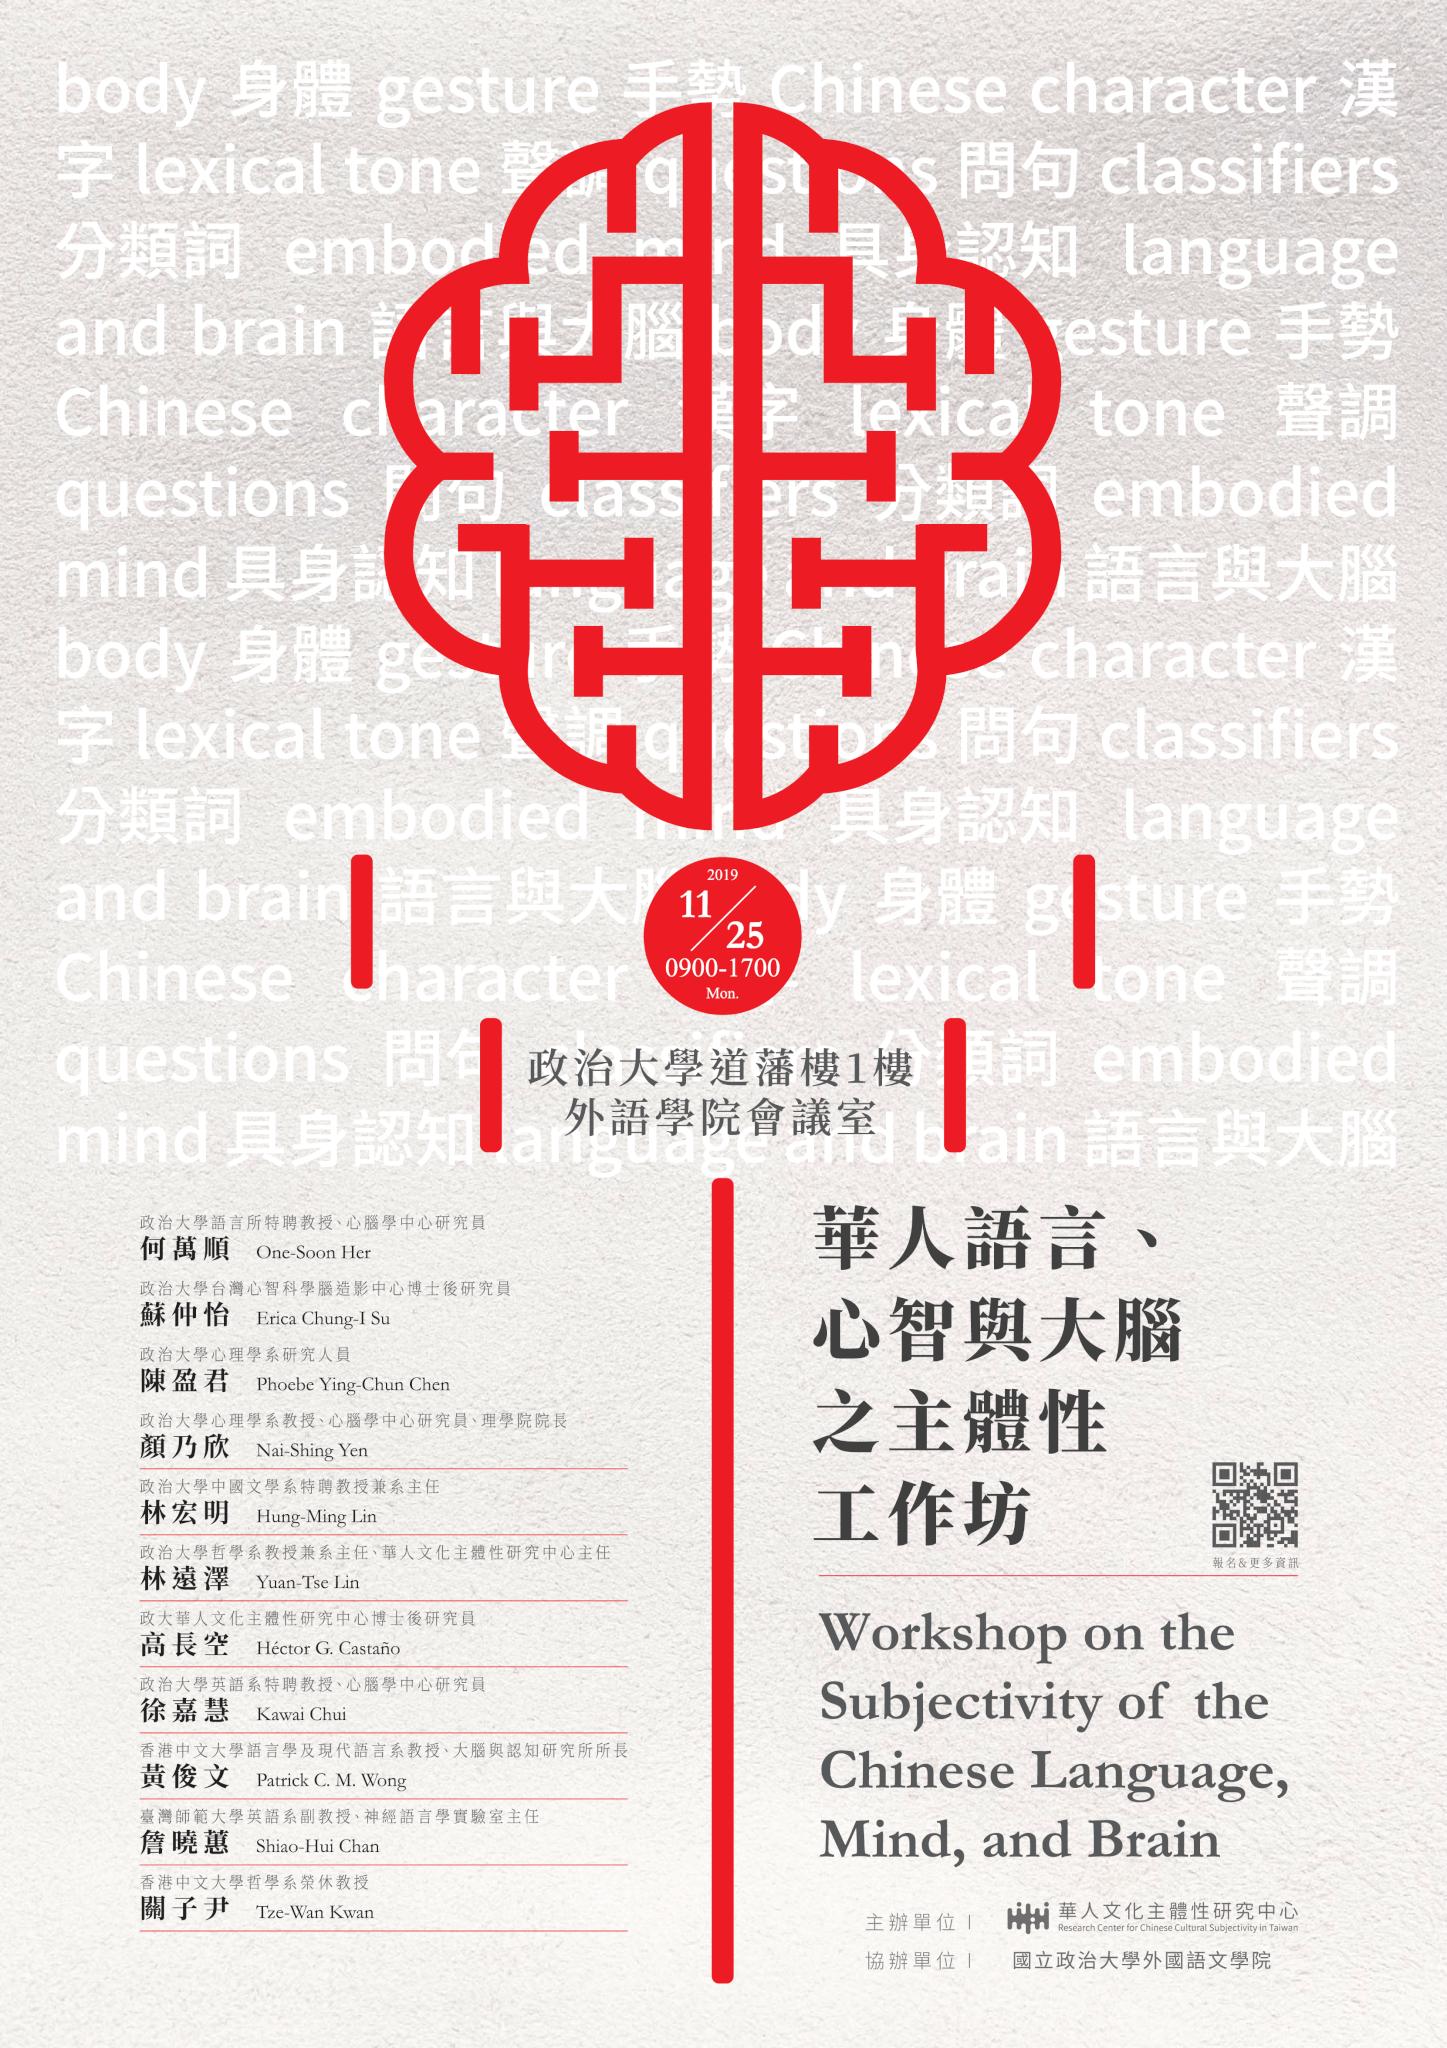 【工作坊資訊】「華人語言、心智與大腦之主體性」工作坊 Workshop on the Subjectivity of the Chinese Language, Mind, and Brain